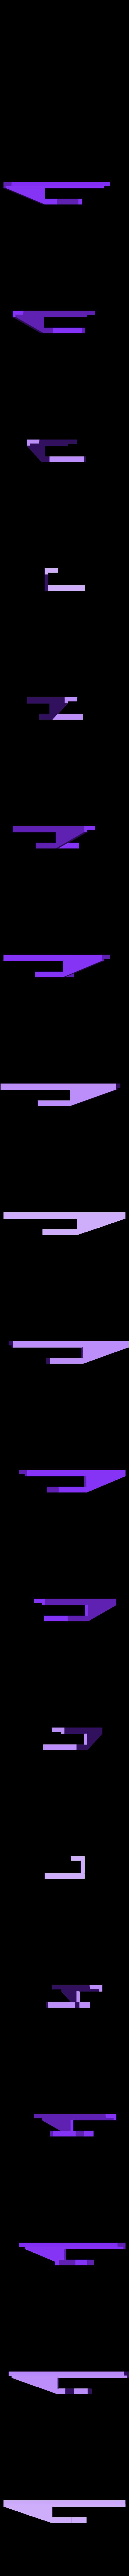 Cab_Support_-_Left-_SCALED.STL Download free STL file 4-8-8-4 Big Boy Locomotive • 3D printer object, RaymondDeLuca